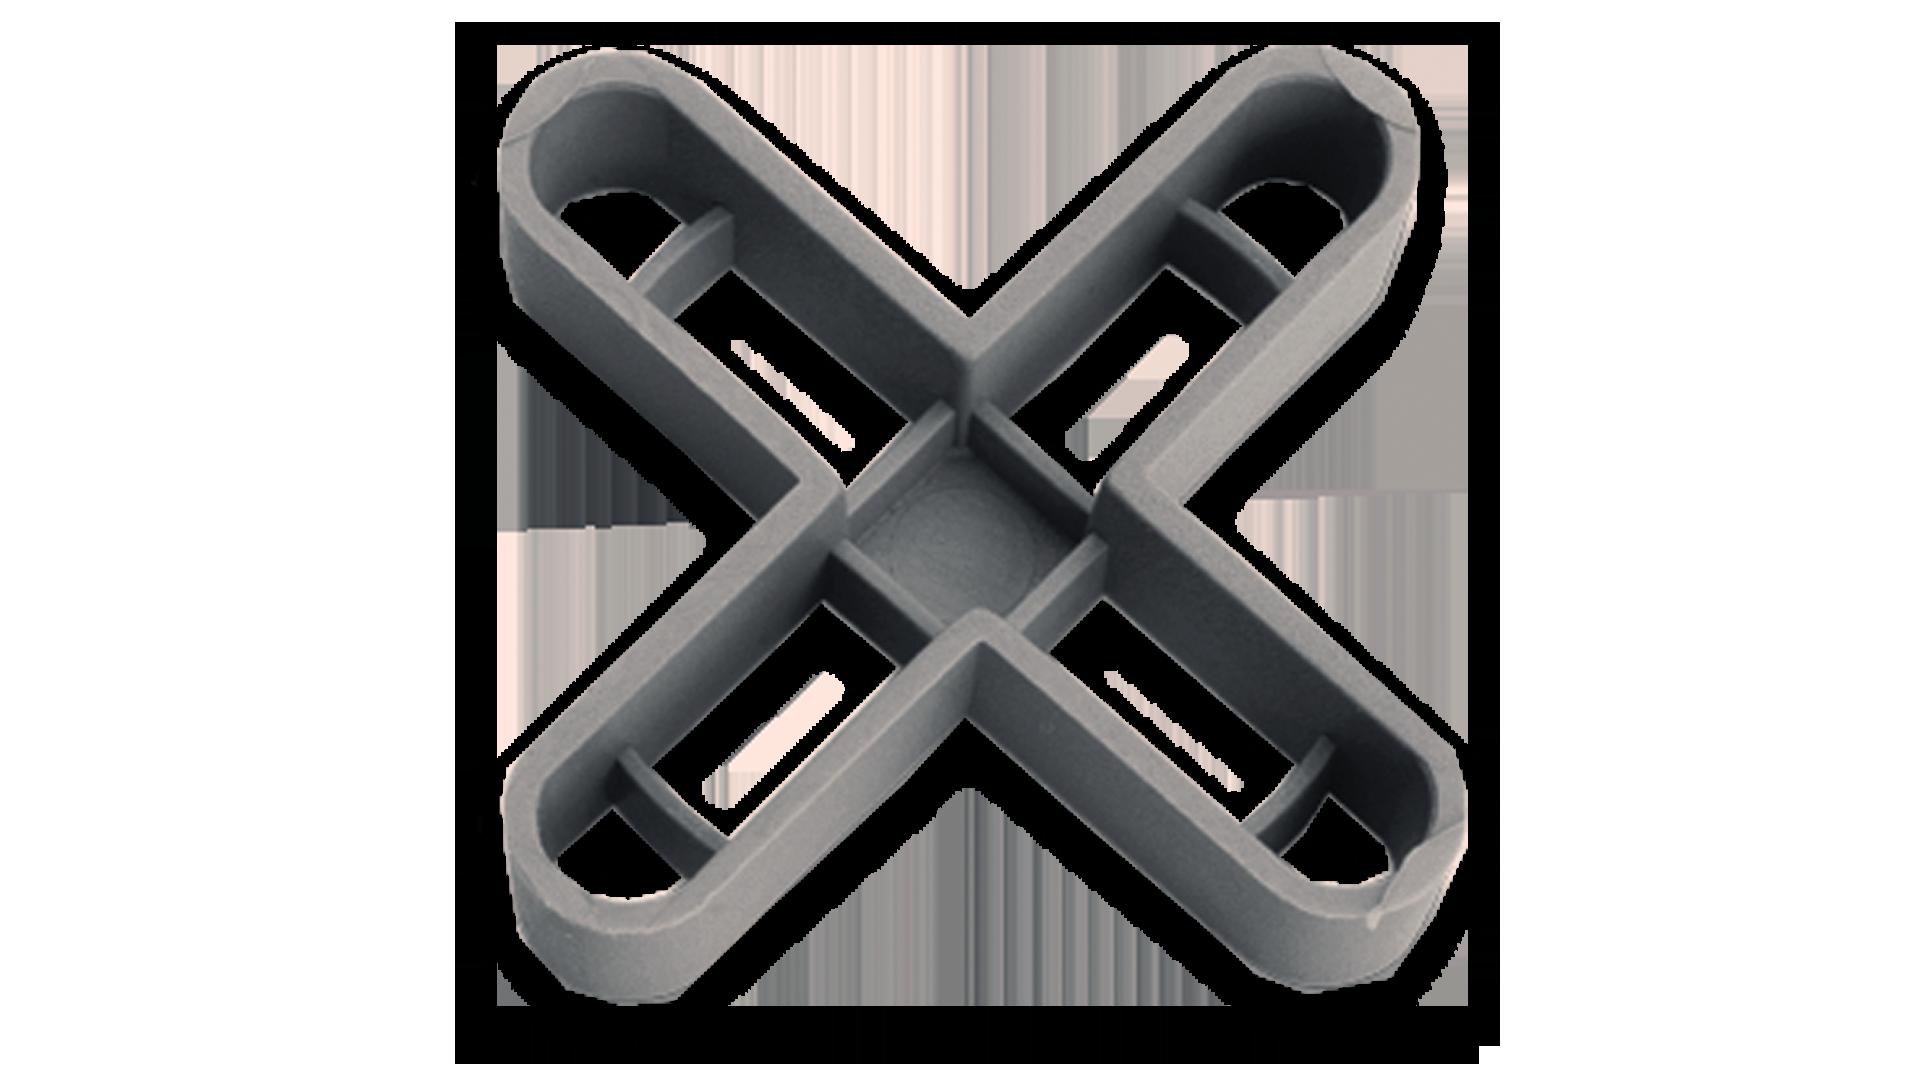 Tile spacers for 10 mm joints rubi tools united kingdom for 10mm floor tile spacers